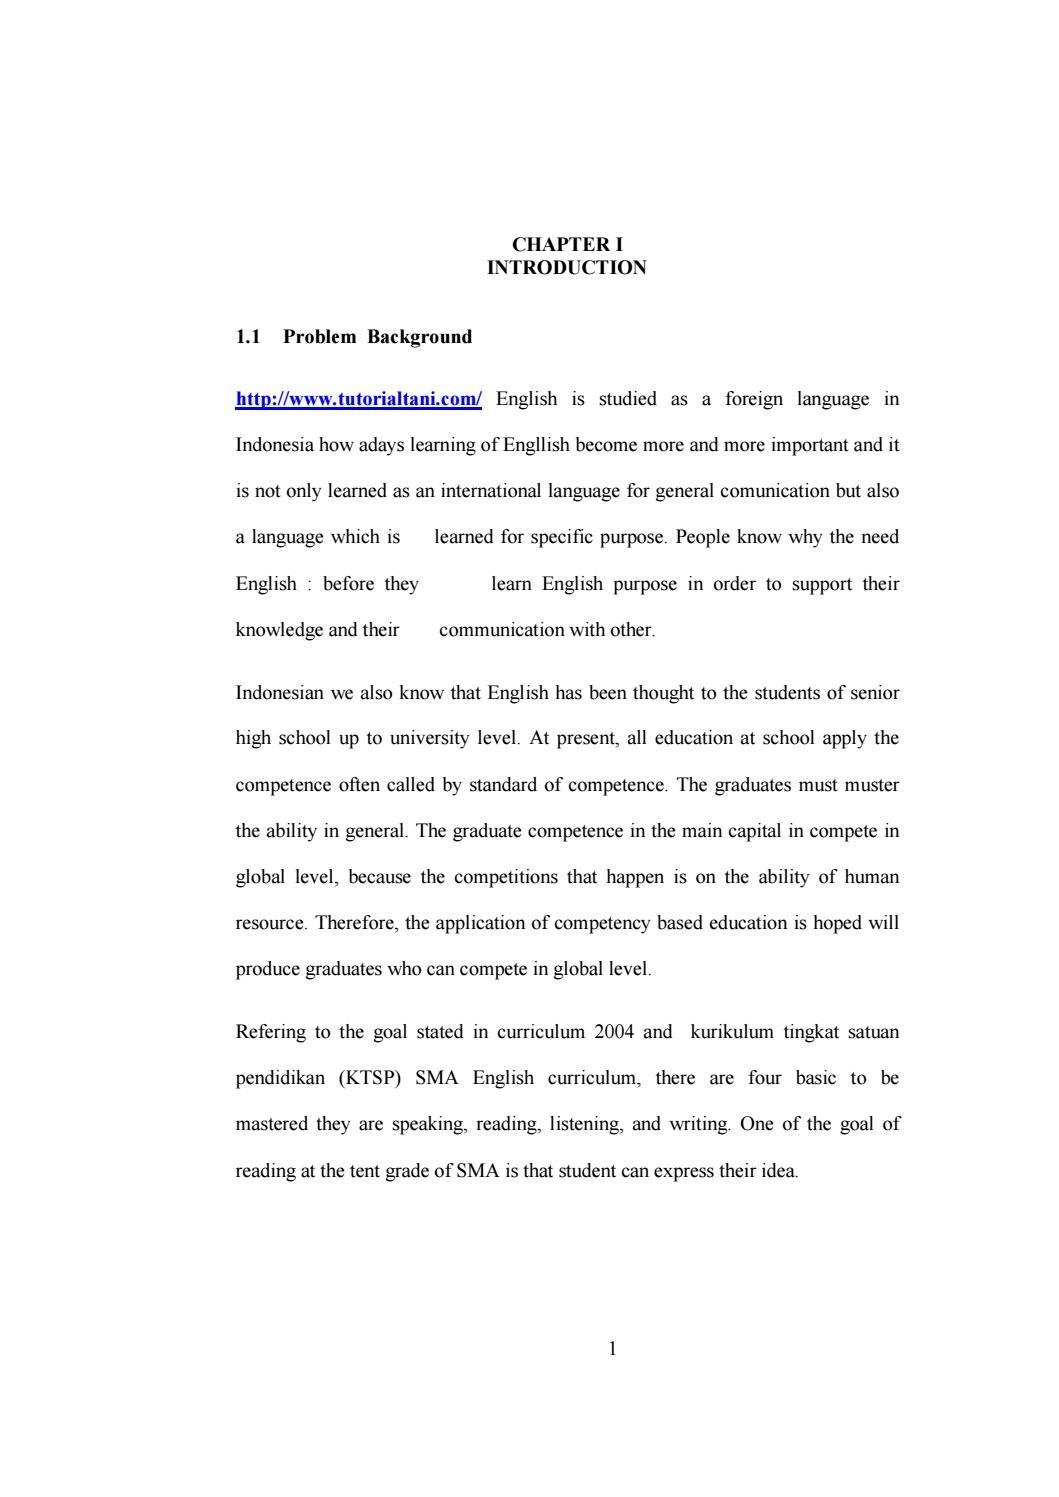 Contoh Skripsi Jurusan Bahasa Inggris Chapter I By Tutorialtani Com Issuu